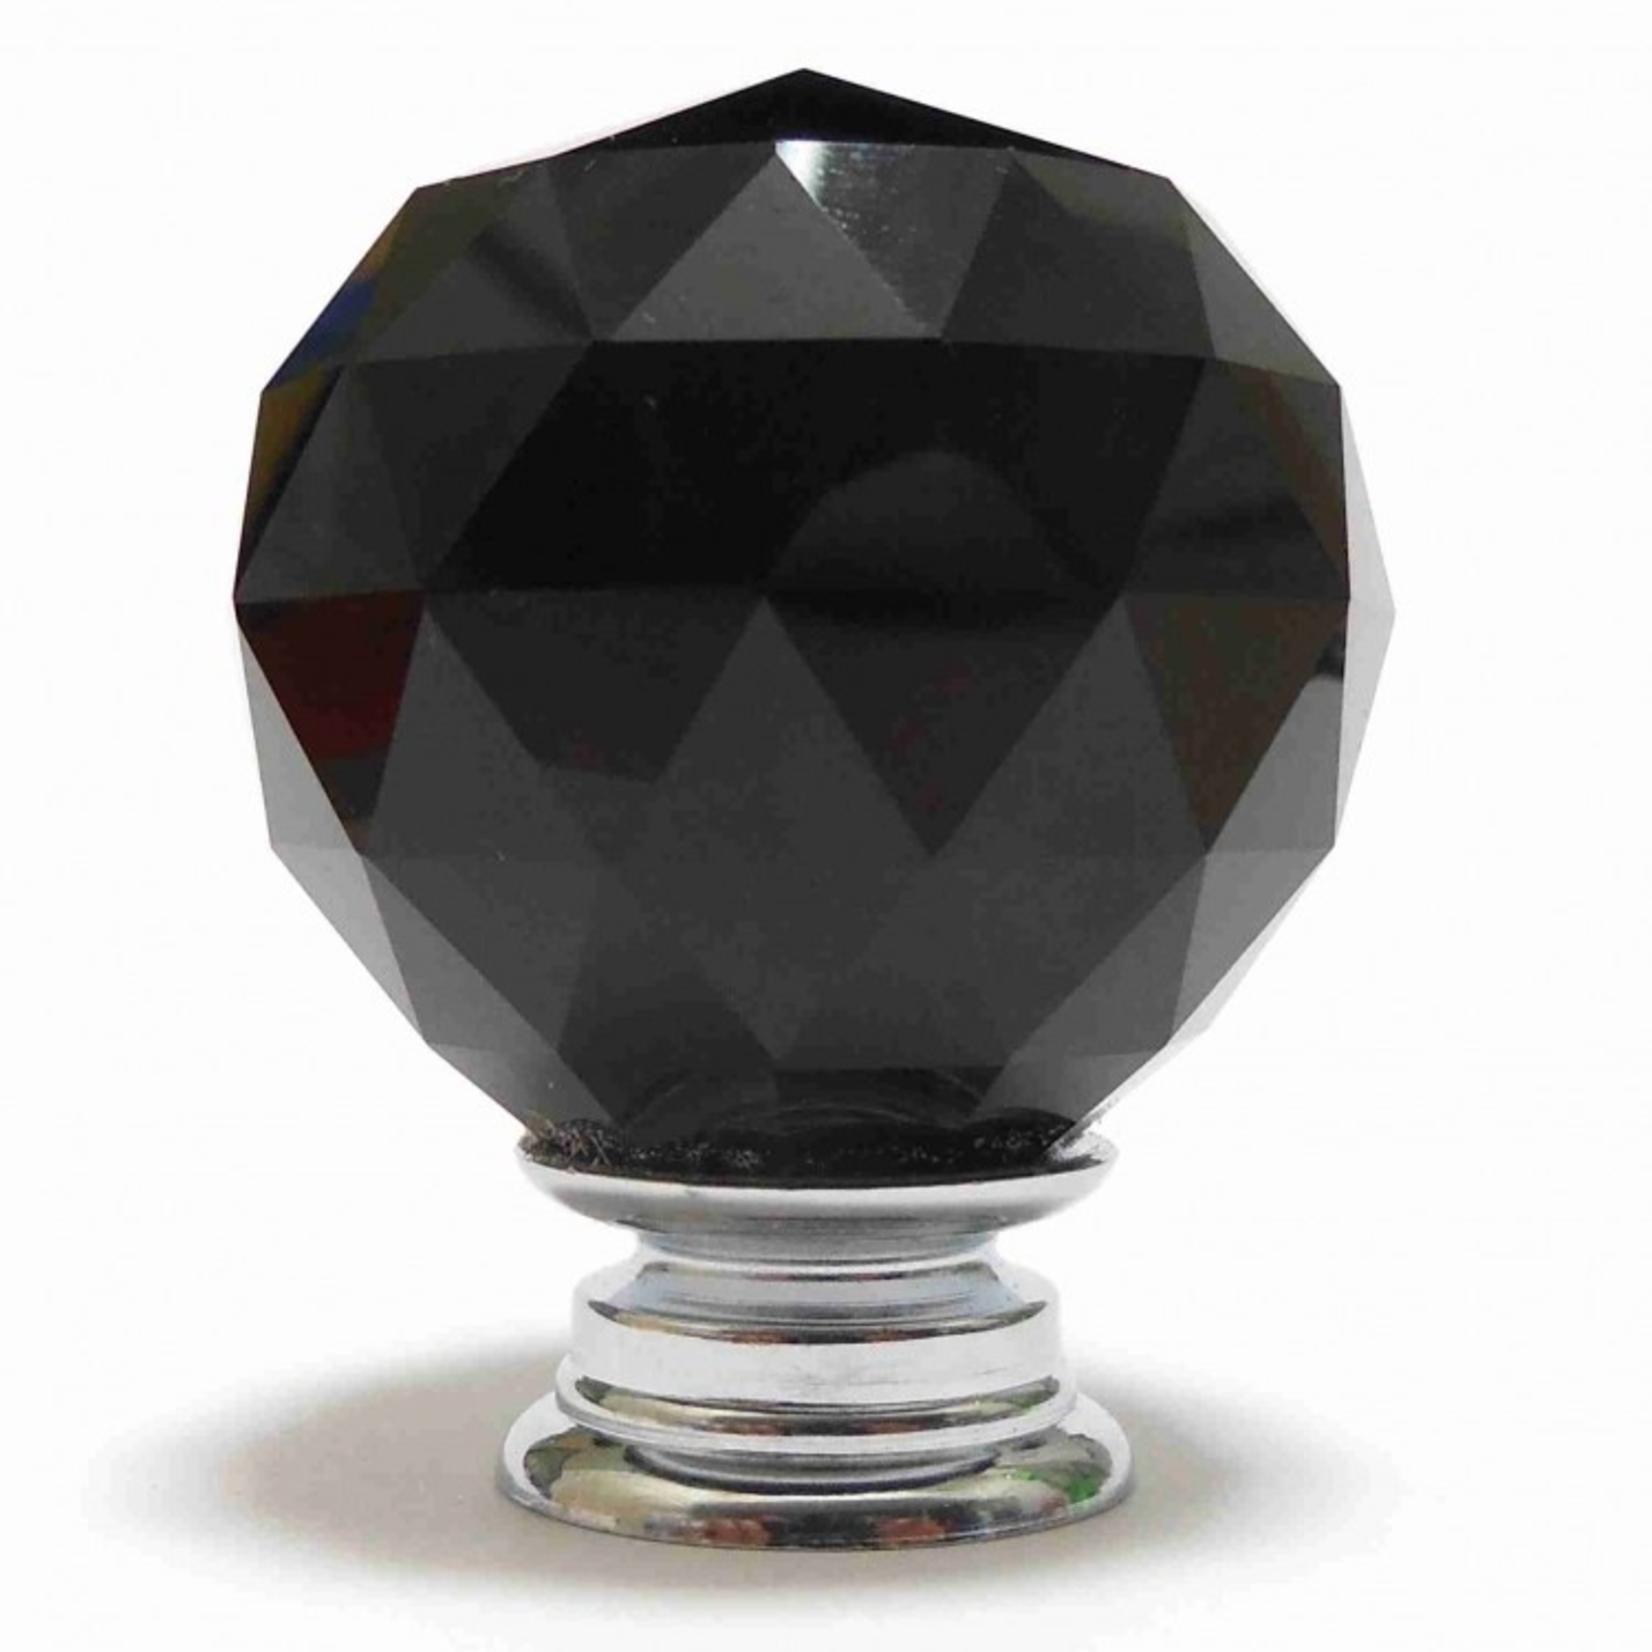 PKA Black Crystal Cut Faceted Glass Knob (Medium)